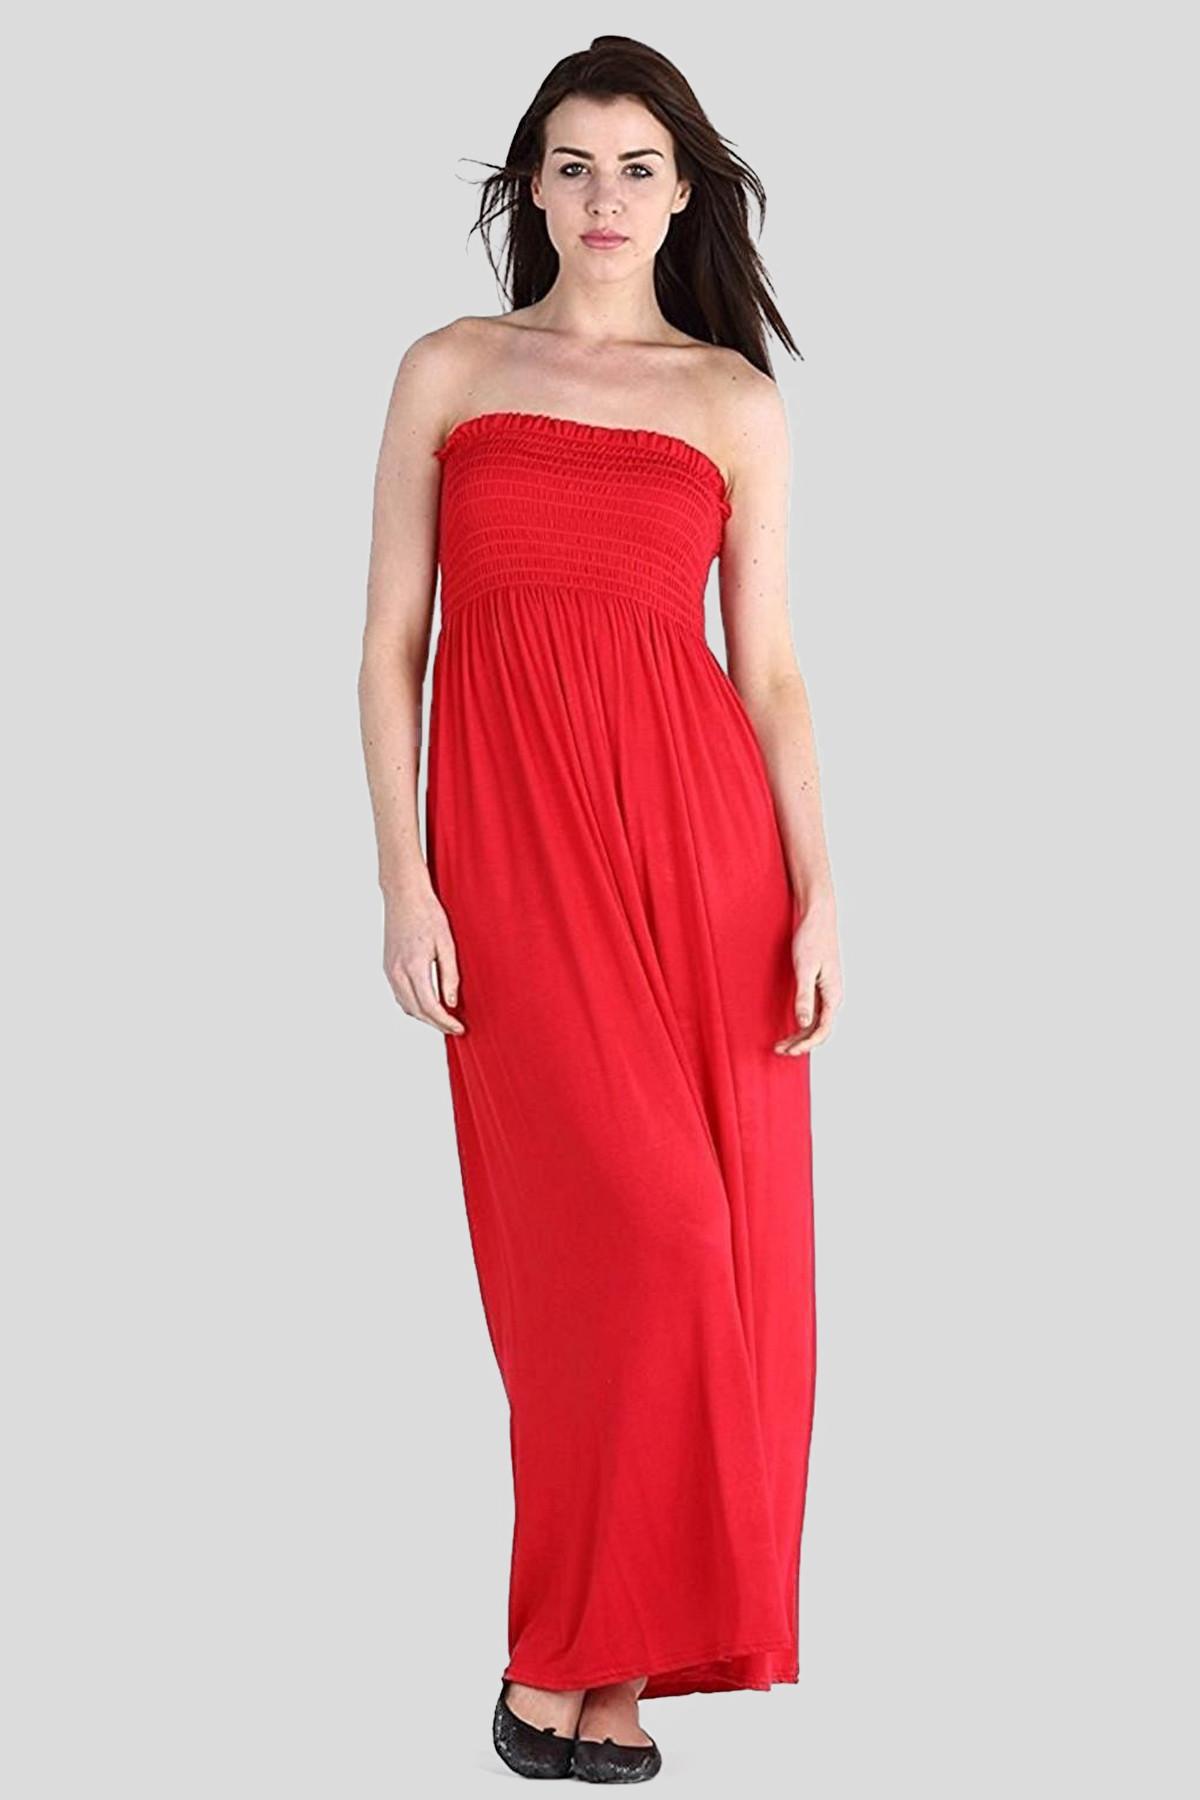 35d7f98b96 THALIA Strapless Sheering Boob Tube Maxi Dress 8-14 - Maxi Dresses ...